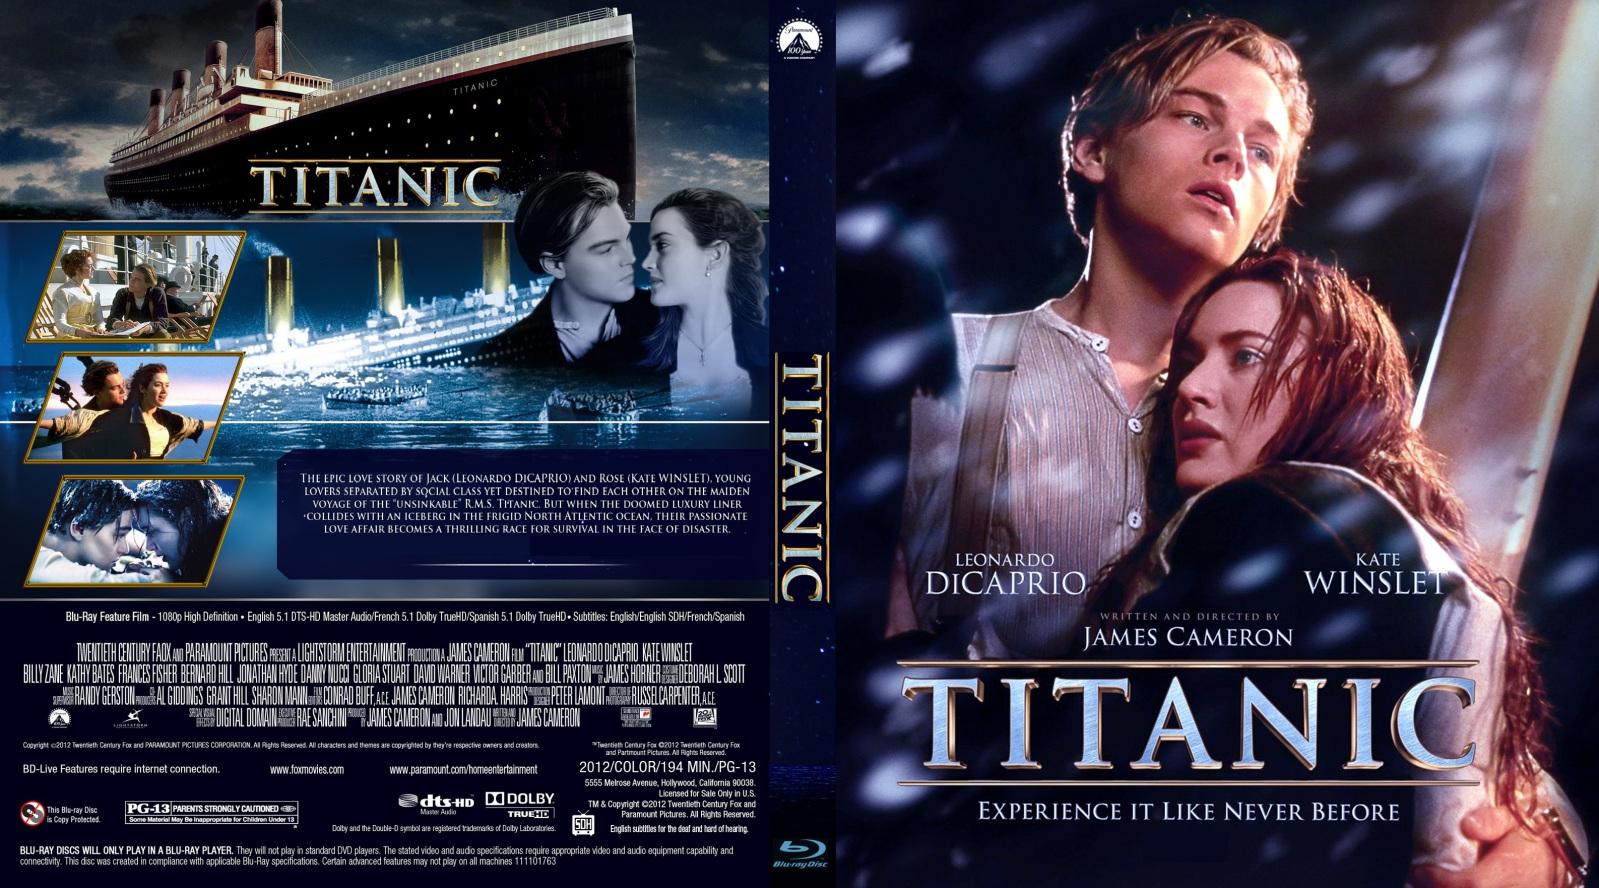 Titanic compact disc blu-ray disc 4k resolution 0 titanic png.